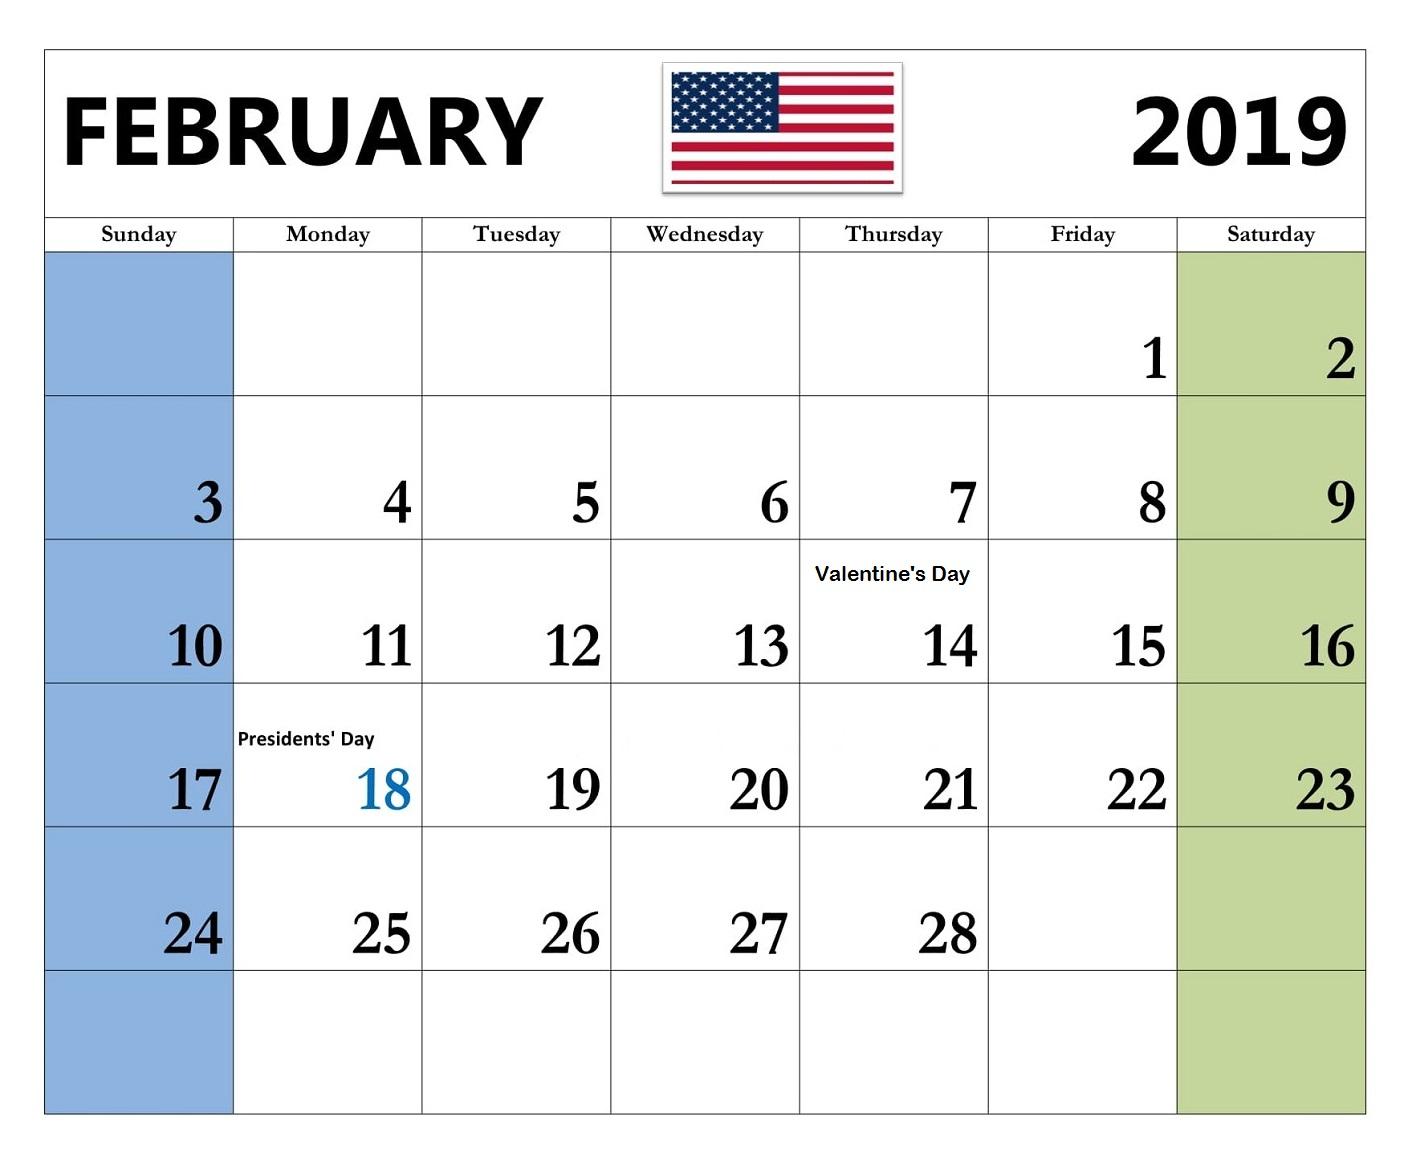 Free February 2019 Landscape Portrait Calendar Template Download